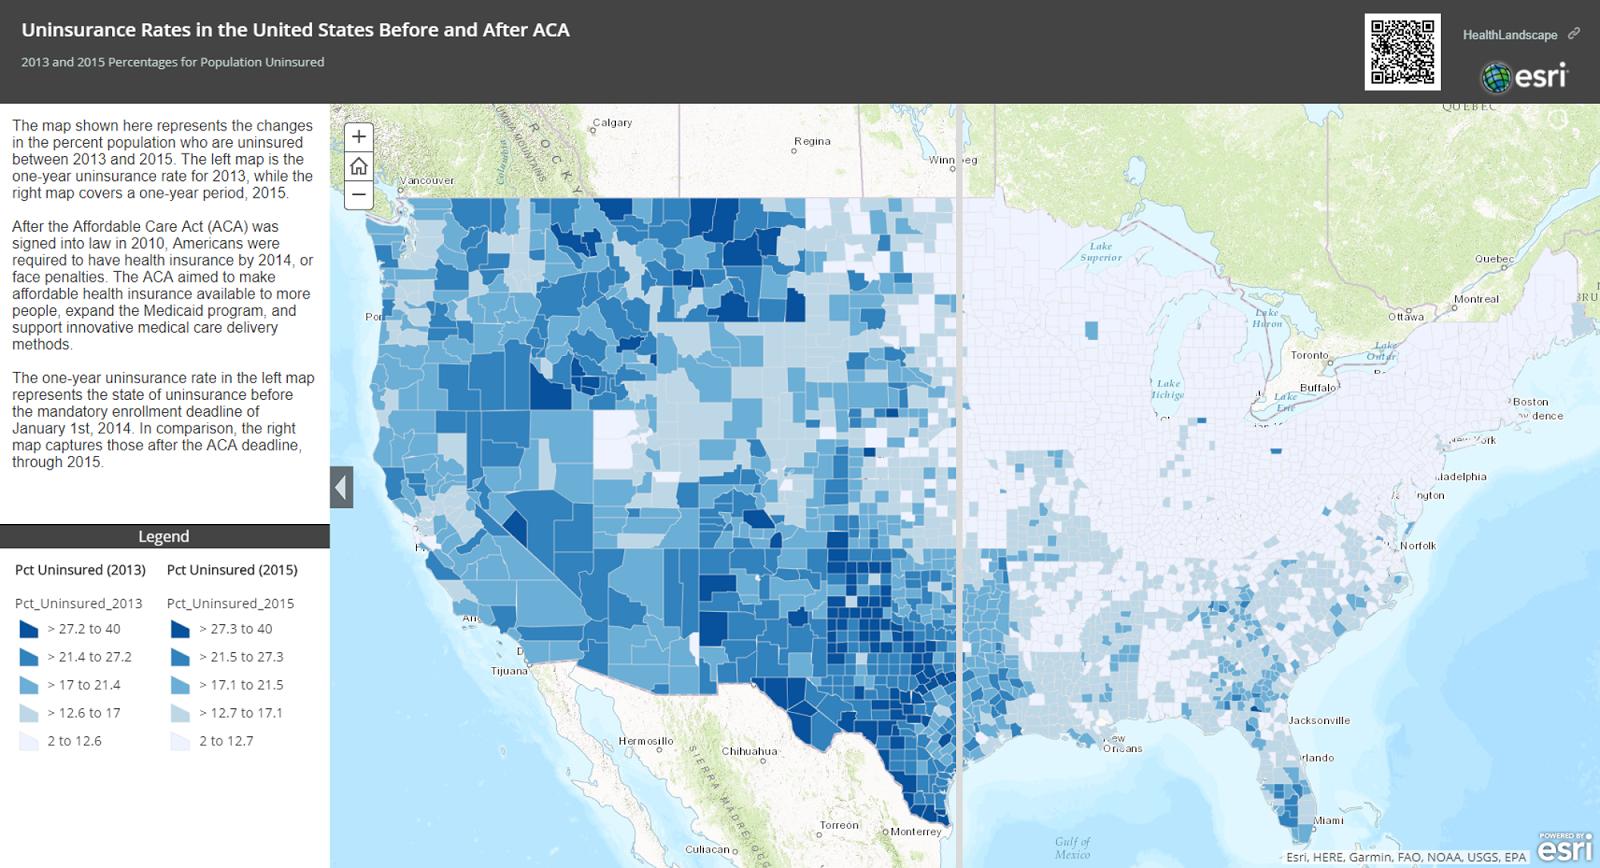 percent uninsured healthlandscape png